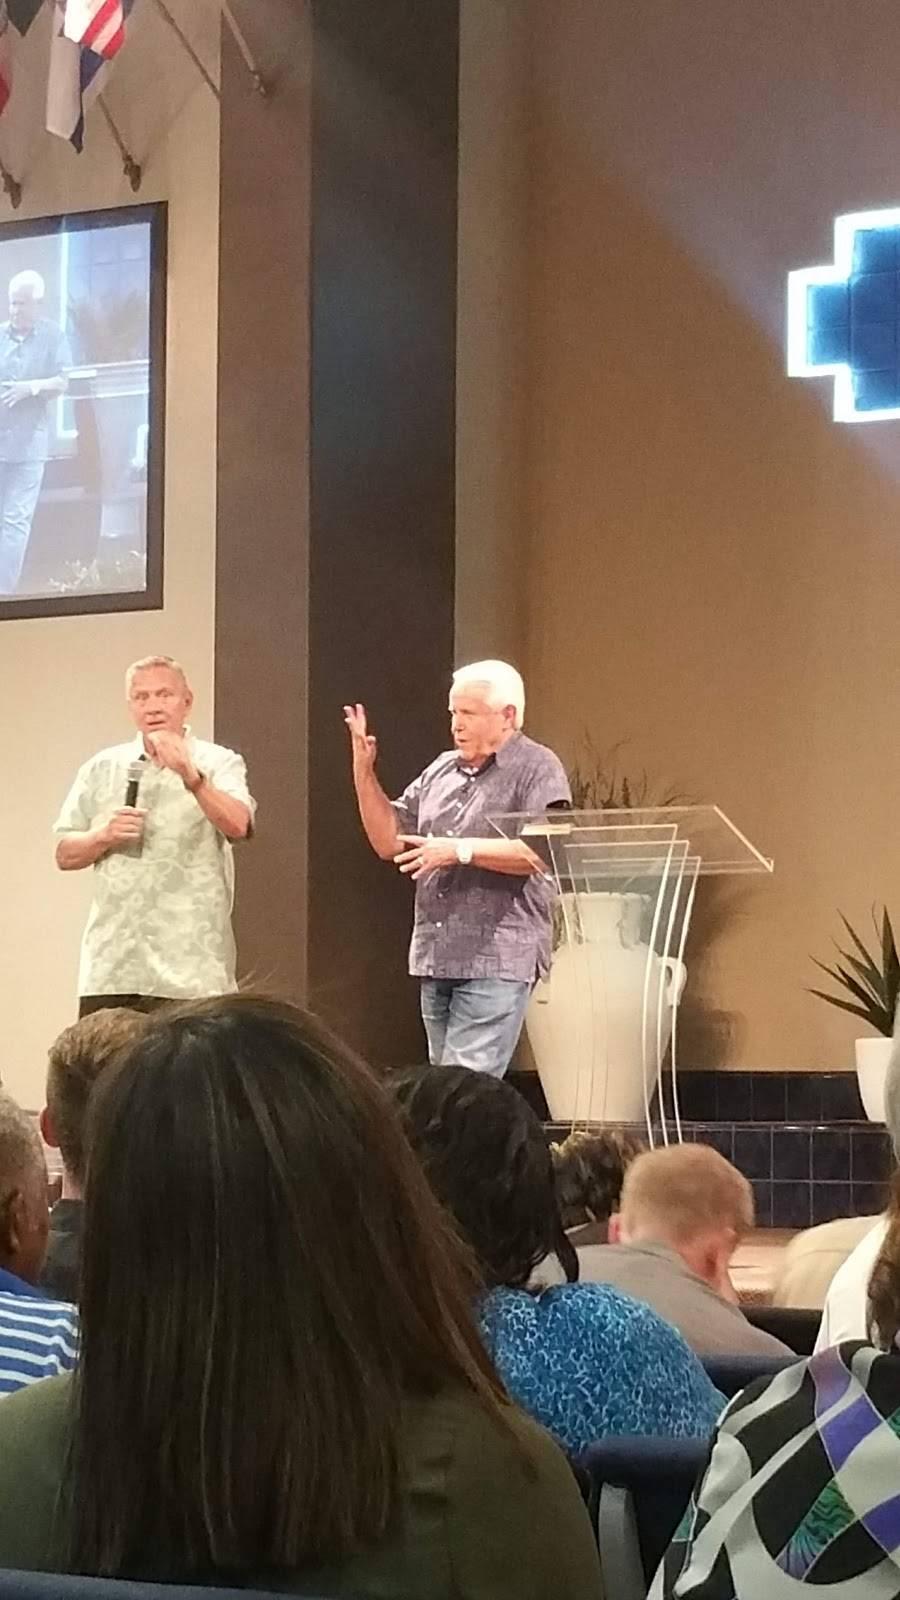 Kern Christian Center - church  | Photo 1 of 2 | Address: 4701 Gosford Rd, Bakersfield, CA 93313, USA | Phone: (661) 664-1000